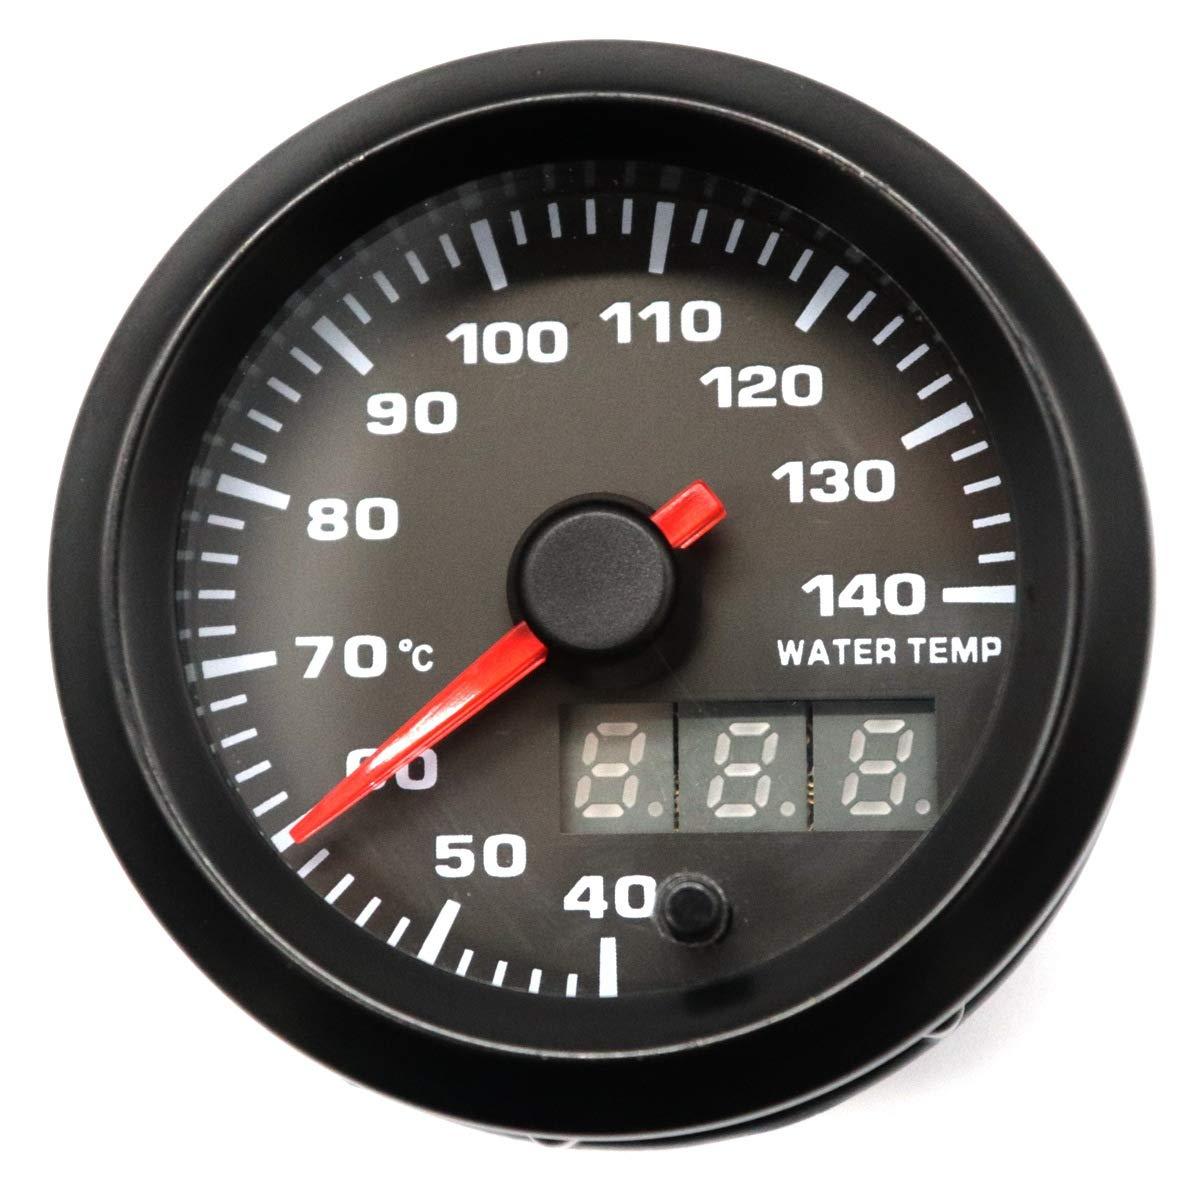 HERCHR Car 12V 52MM 2 Inch LED Backlight Water Temperature Meter, 40~140°C With Sensor, Black